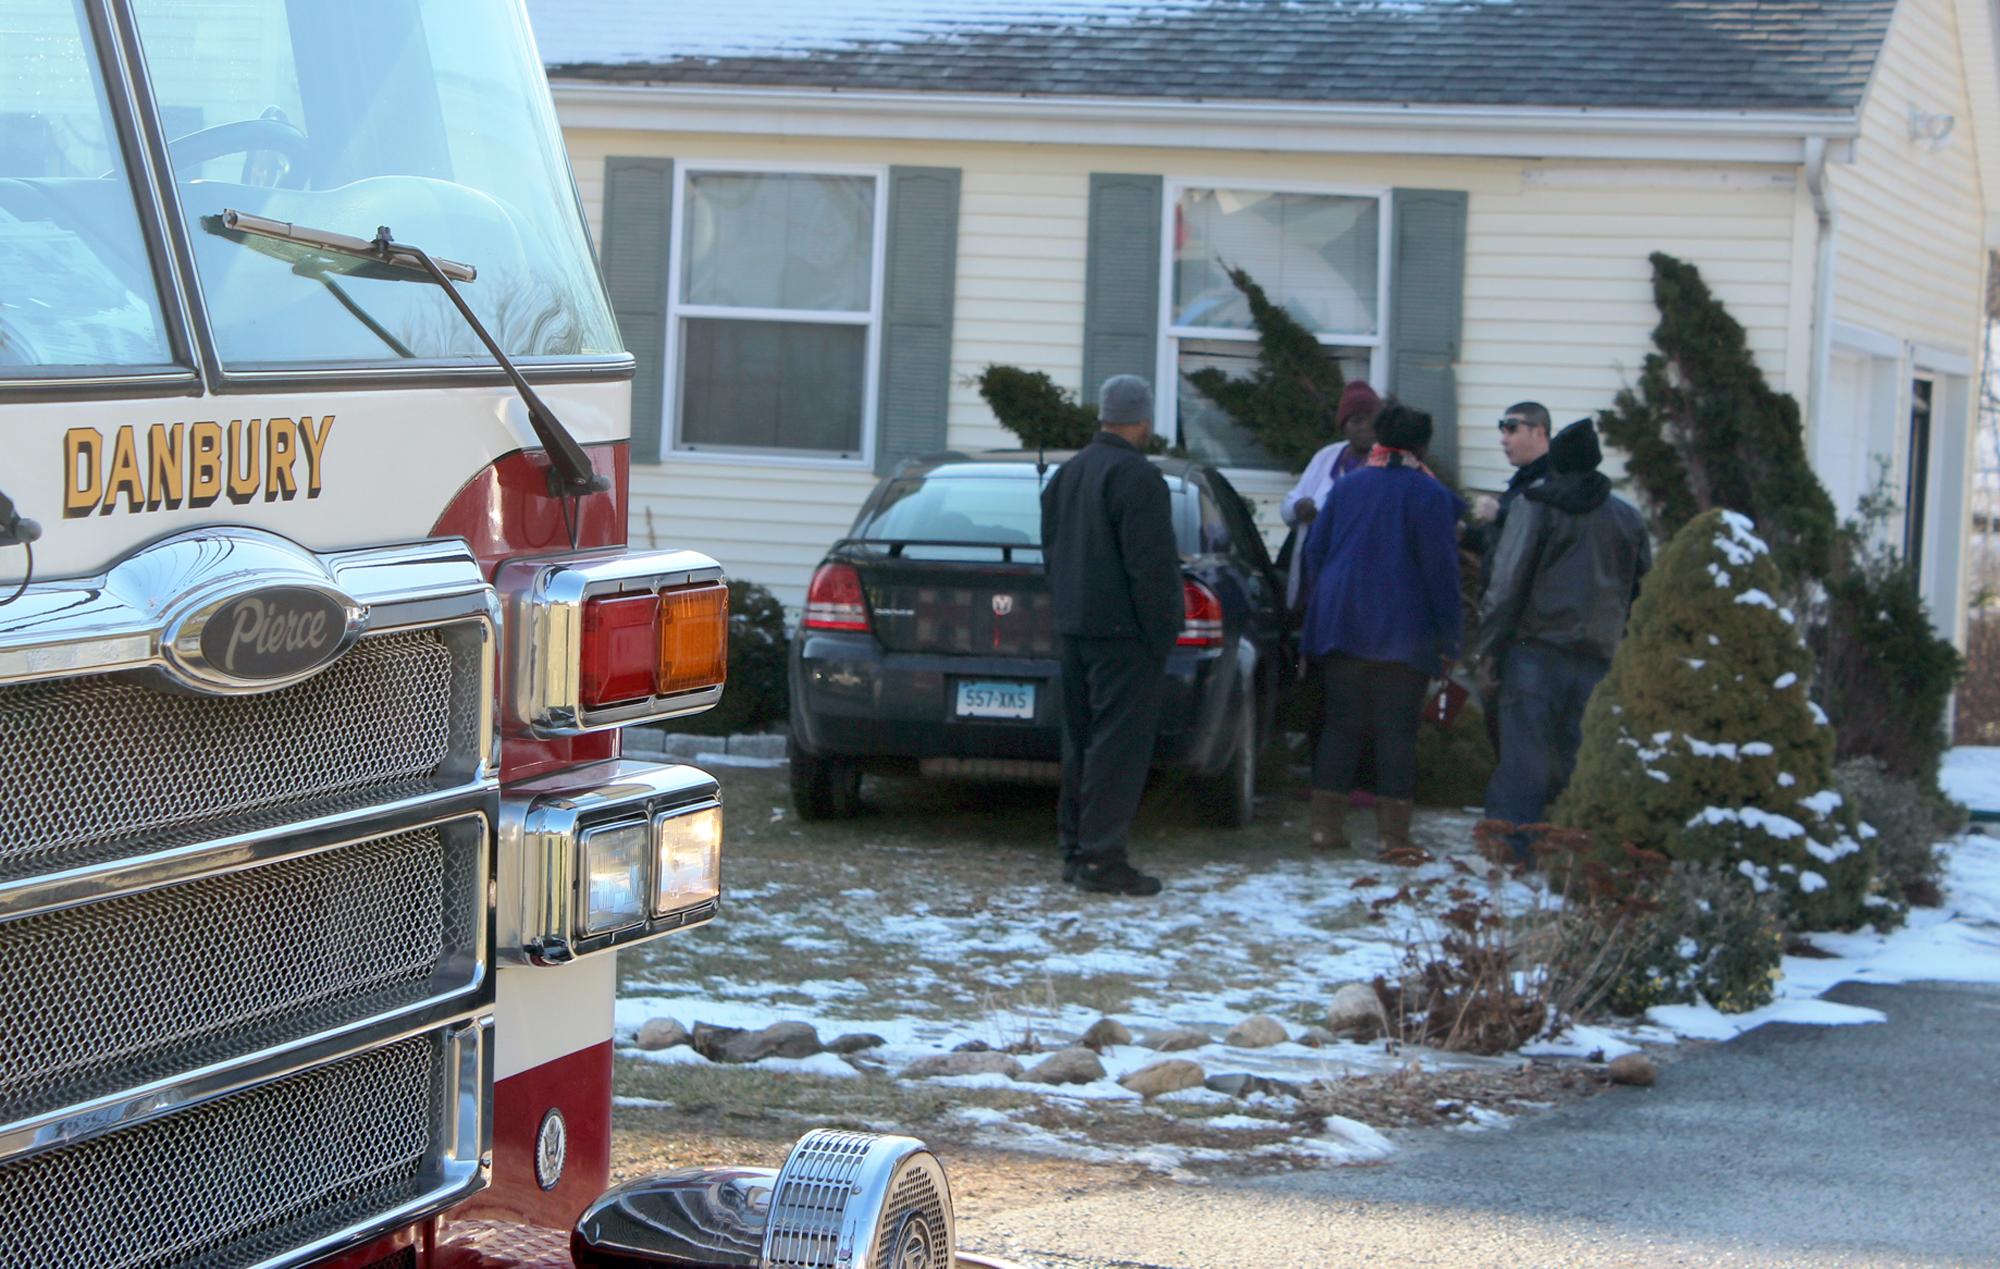 Woman crashes into Danbury home - Connecticut Post